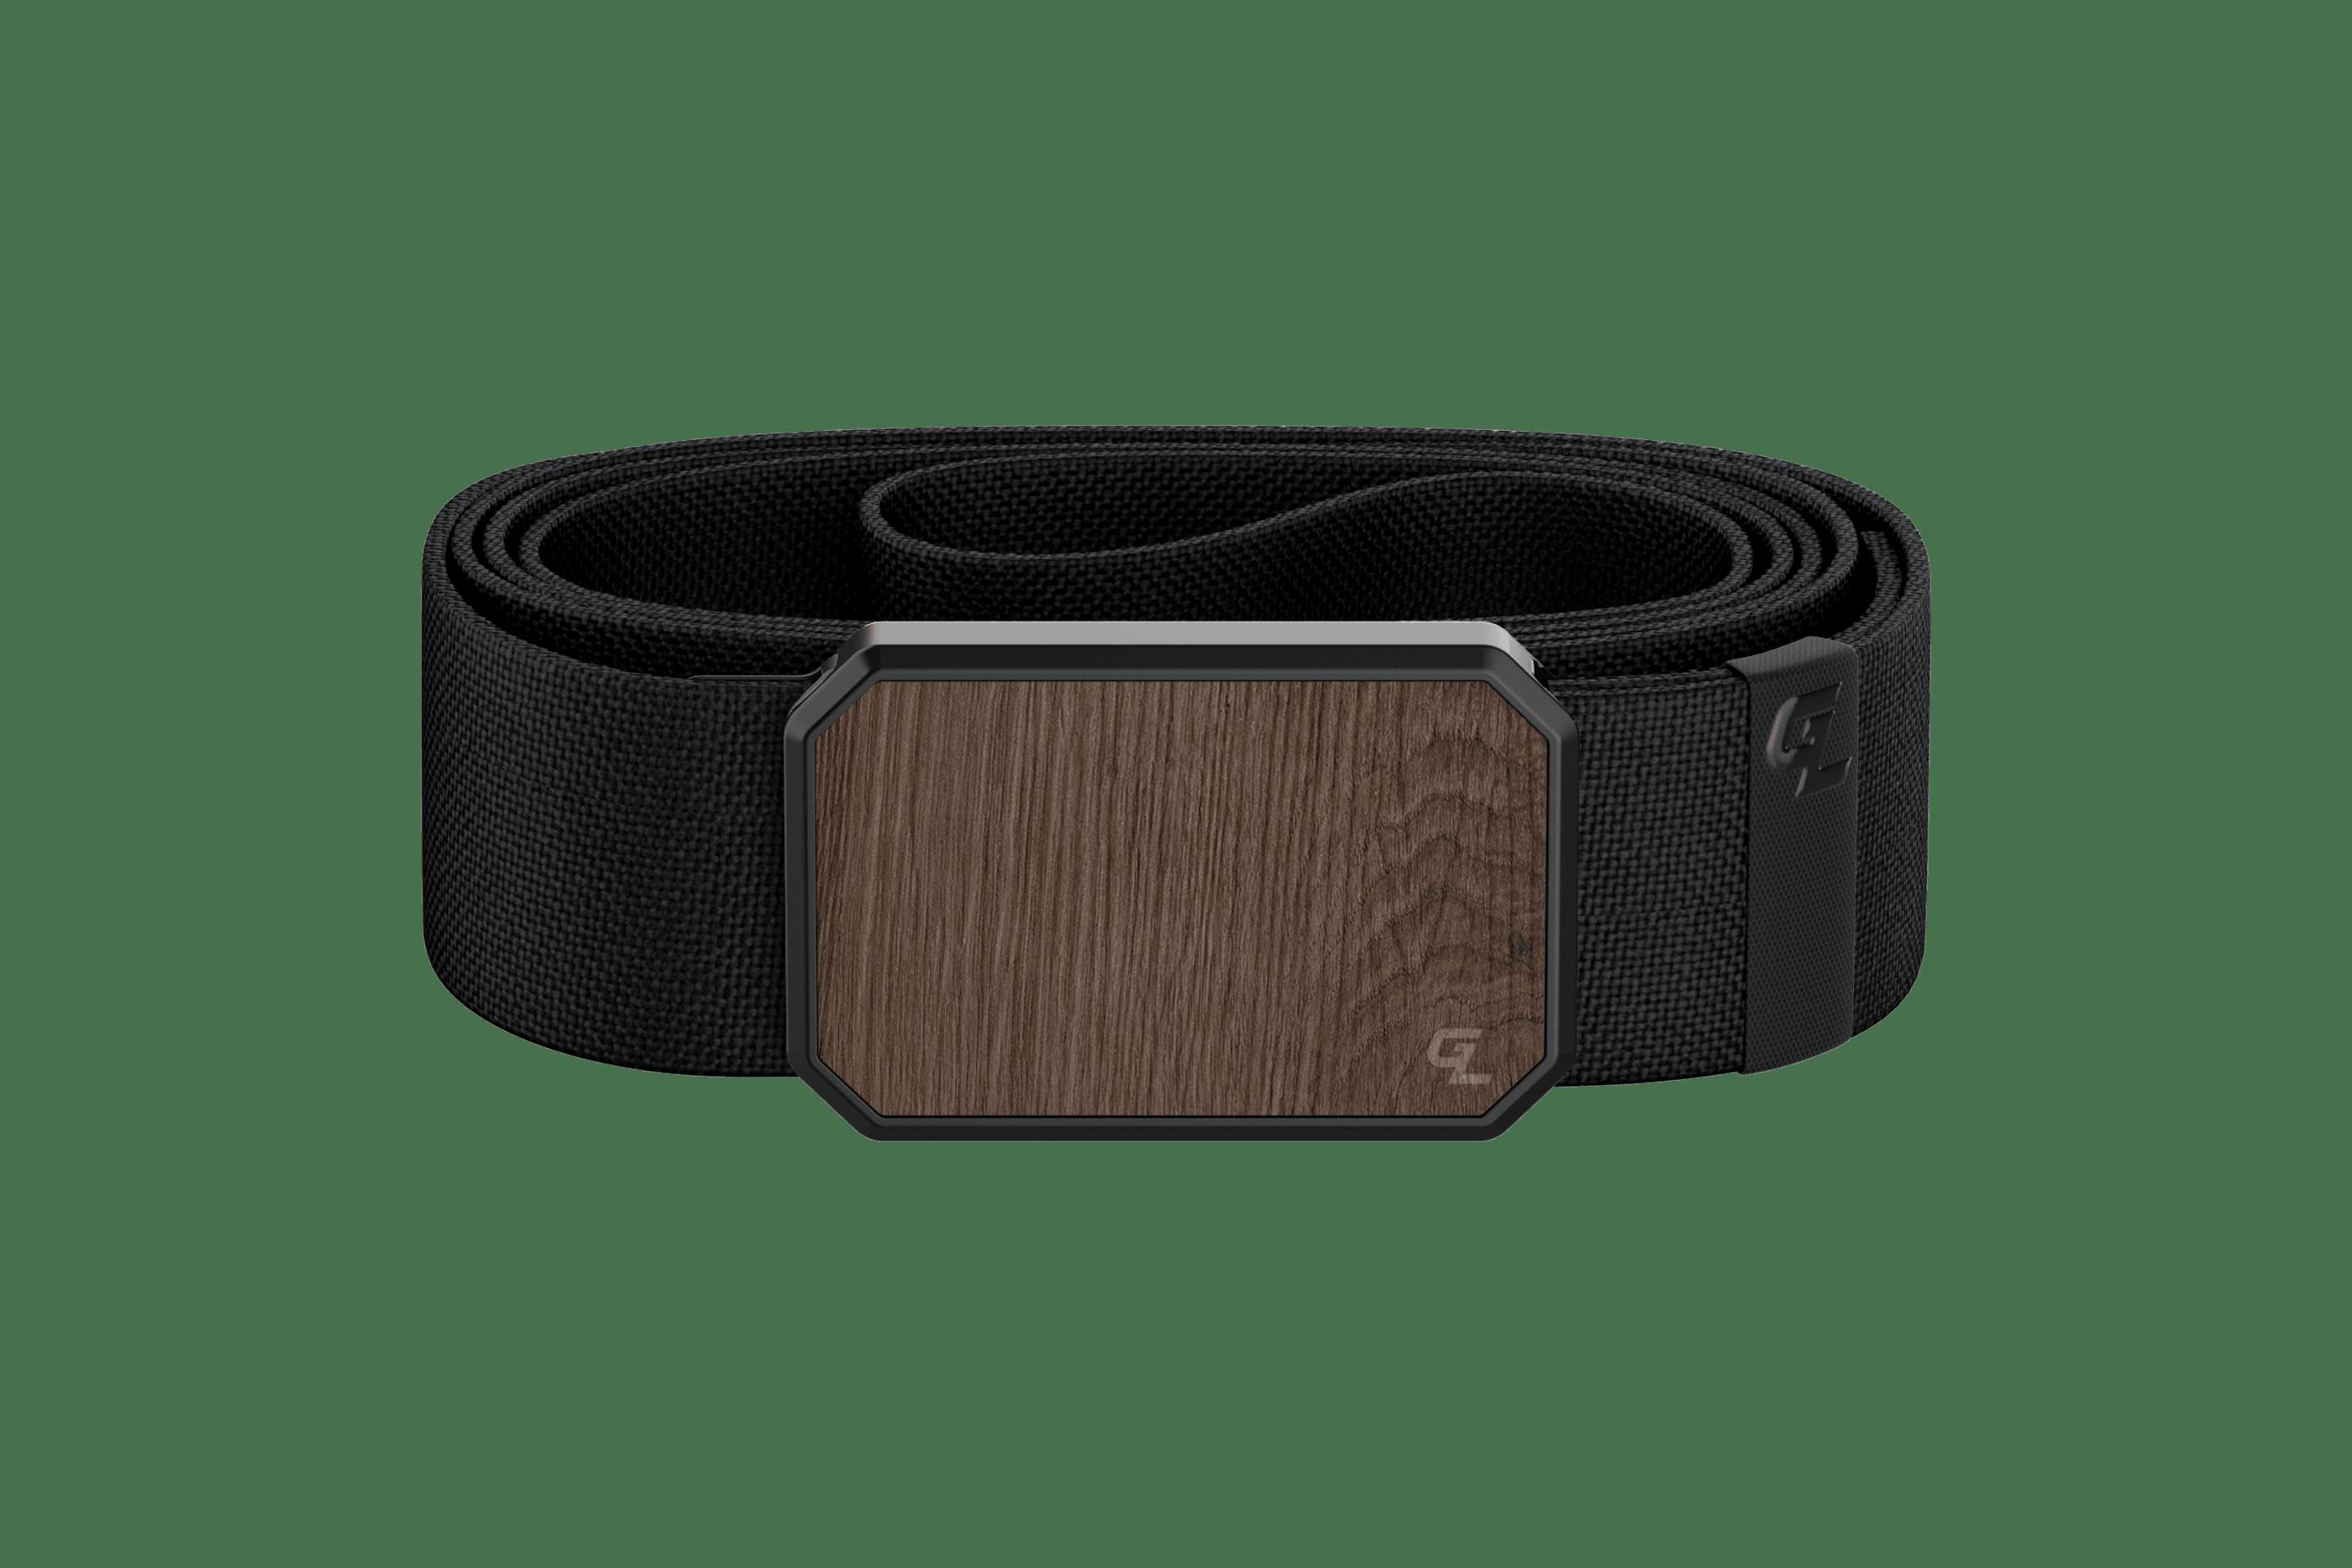 Groove Belt Walnut/Black  viewed front on